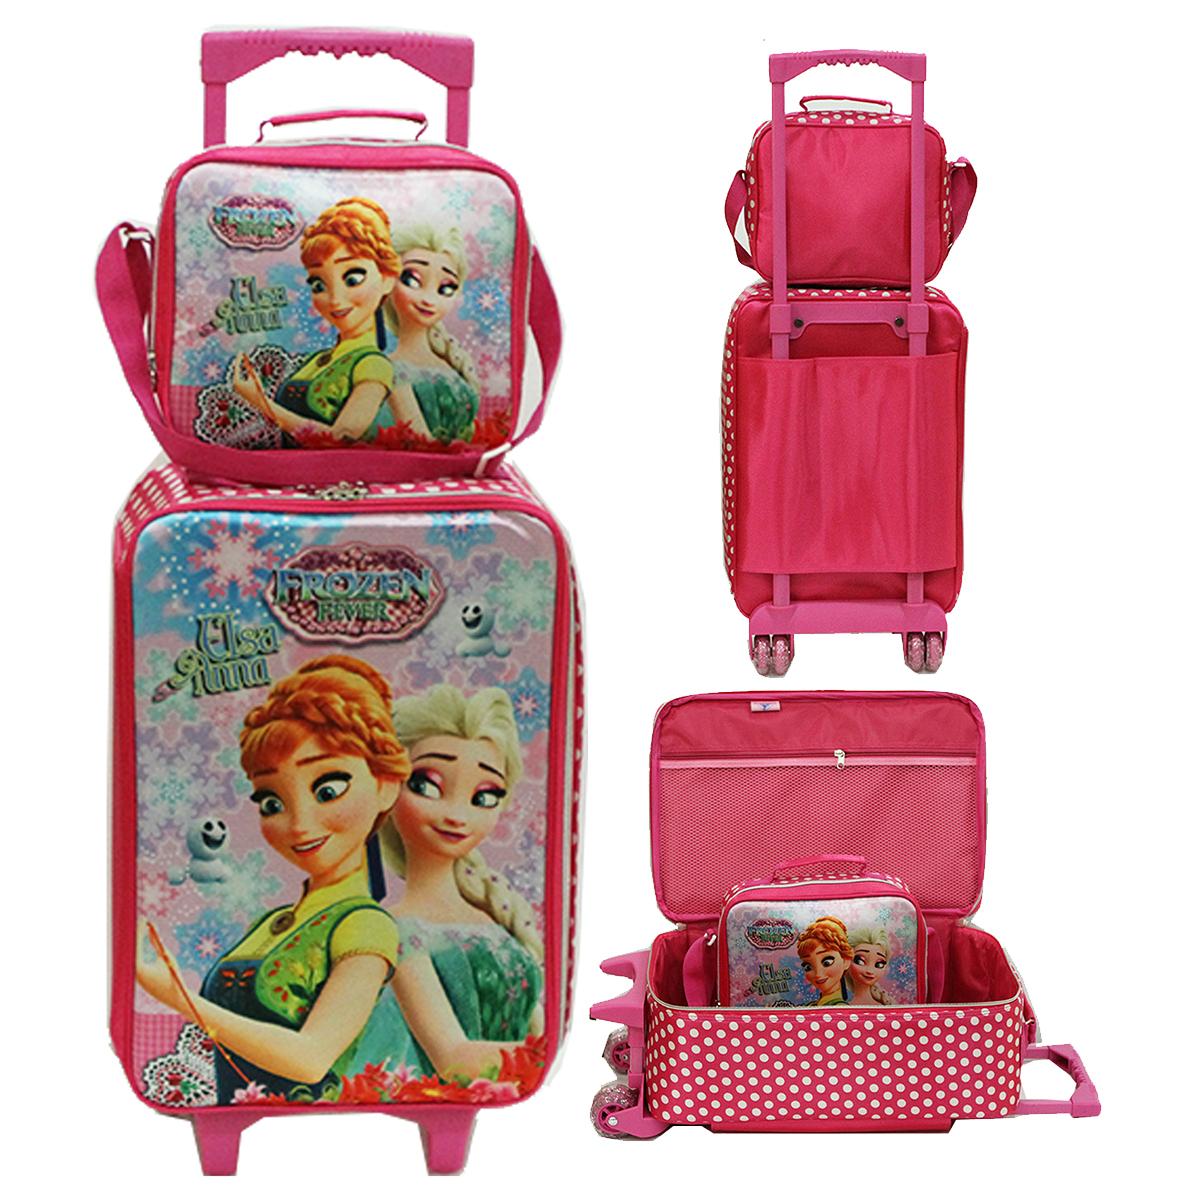 Beli Onlan Disney Frozen Fever Set Koper Lunch Bag Anak Bahan Satin Berkualitas New Arrival Pink Murah